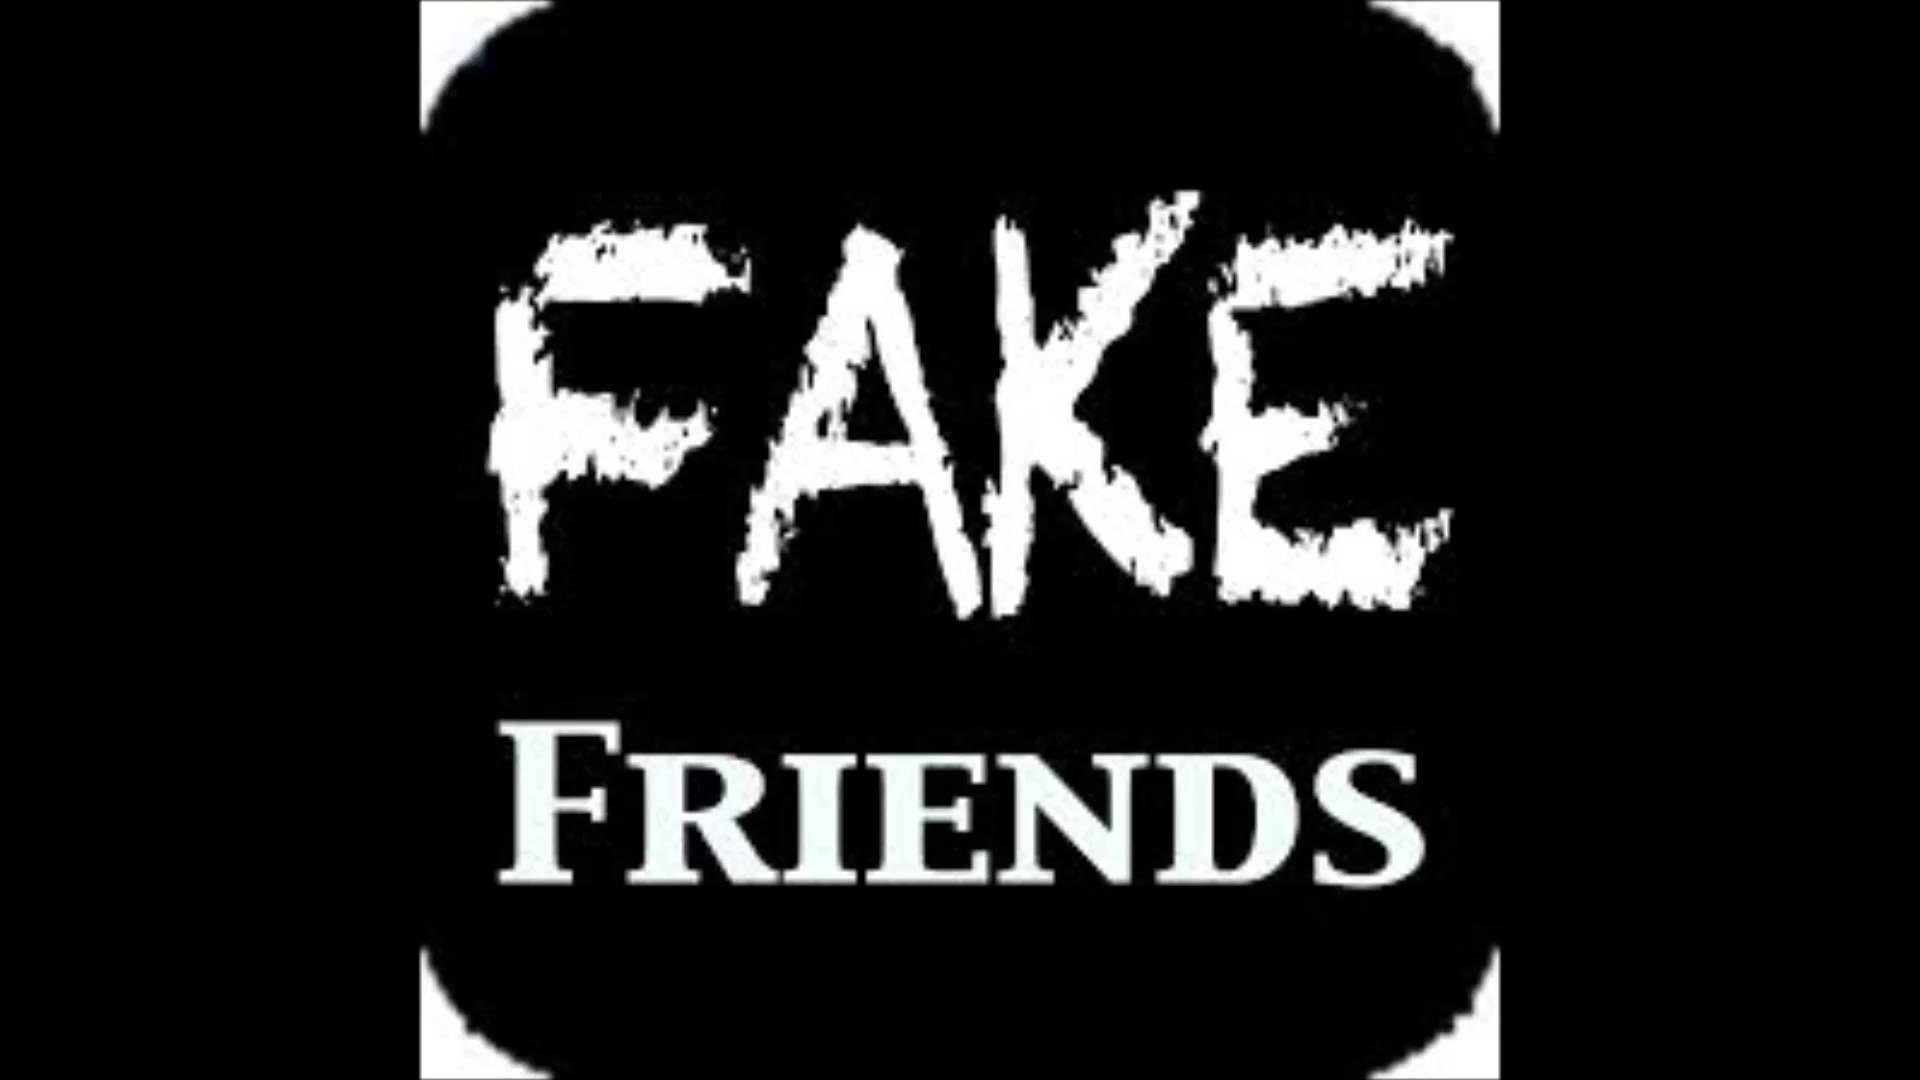 Ben noto 25 Frasi e messaggi sui falsi amici - Frasi, aforismi e citazioni ZU05